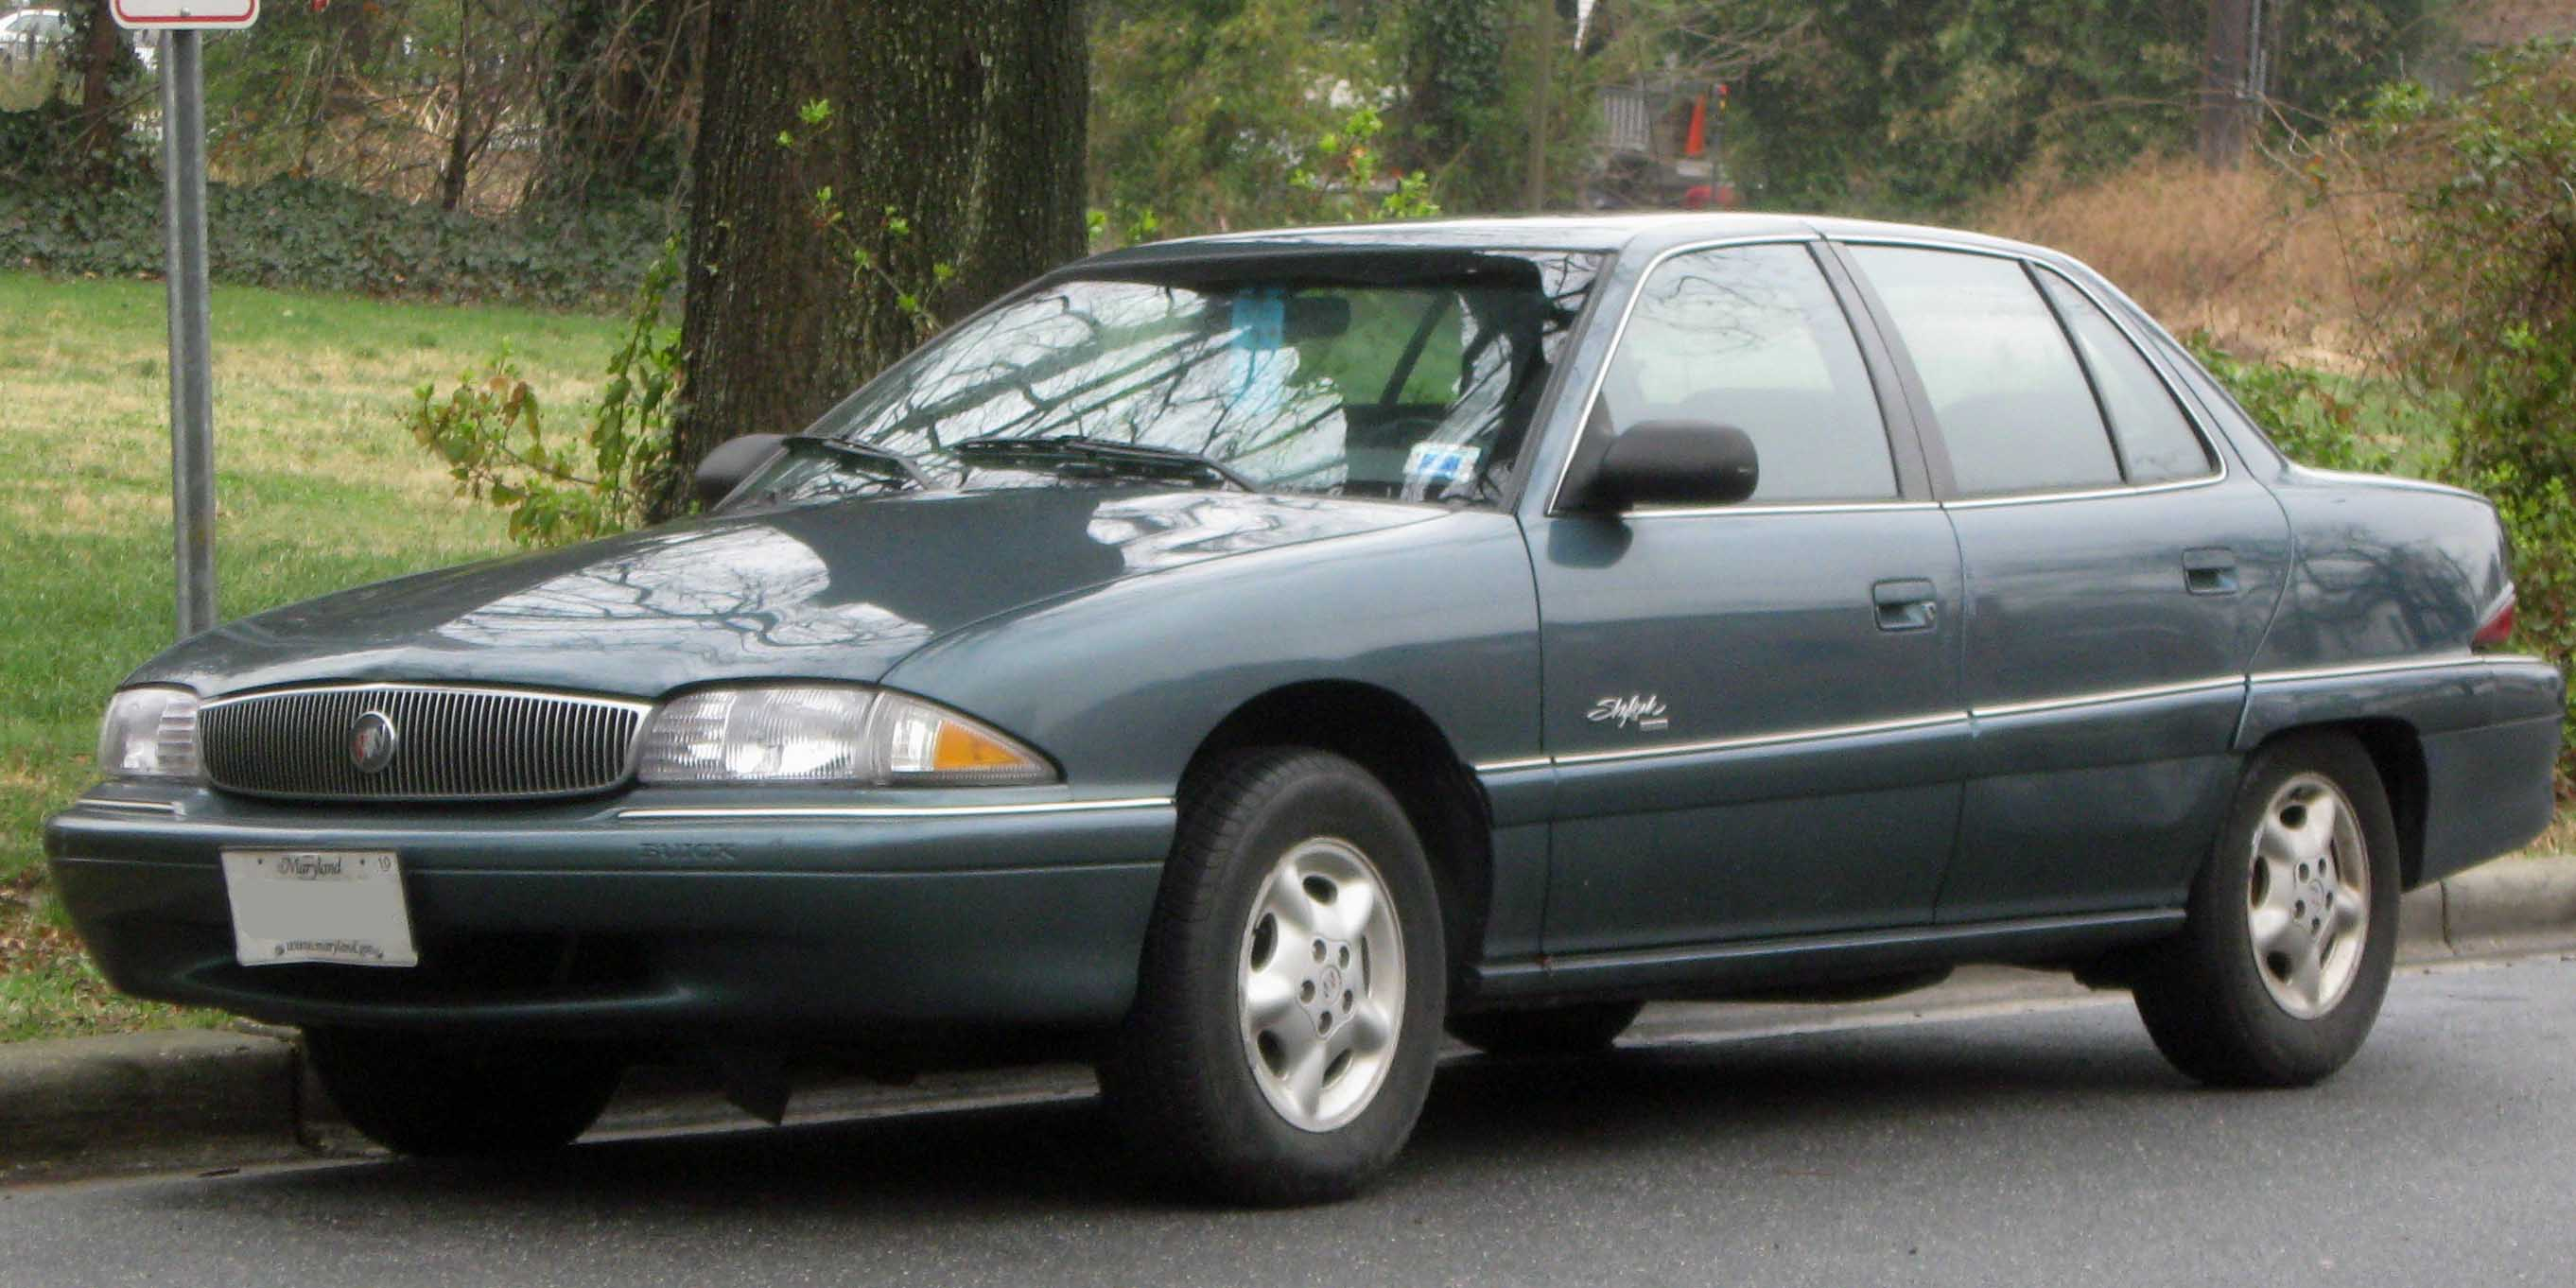 Buick Skylark 1994 Photo - 1